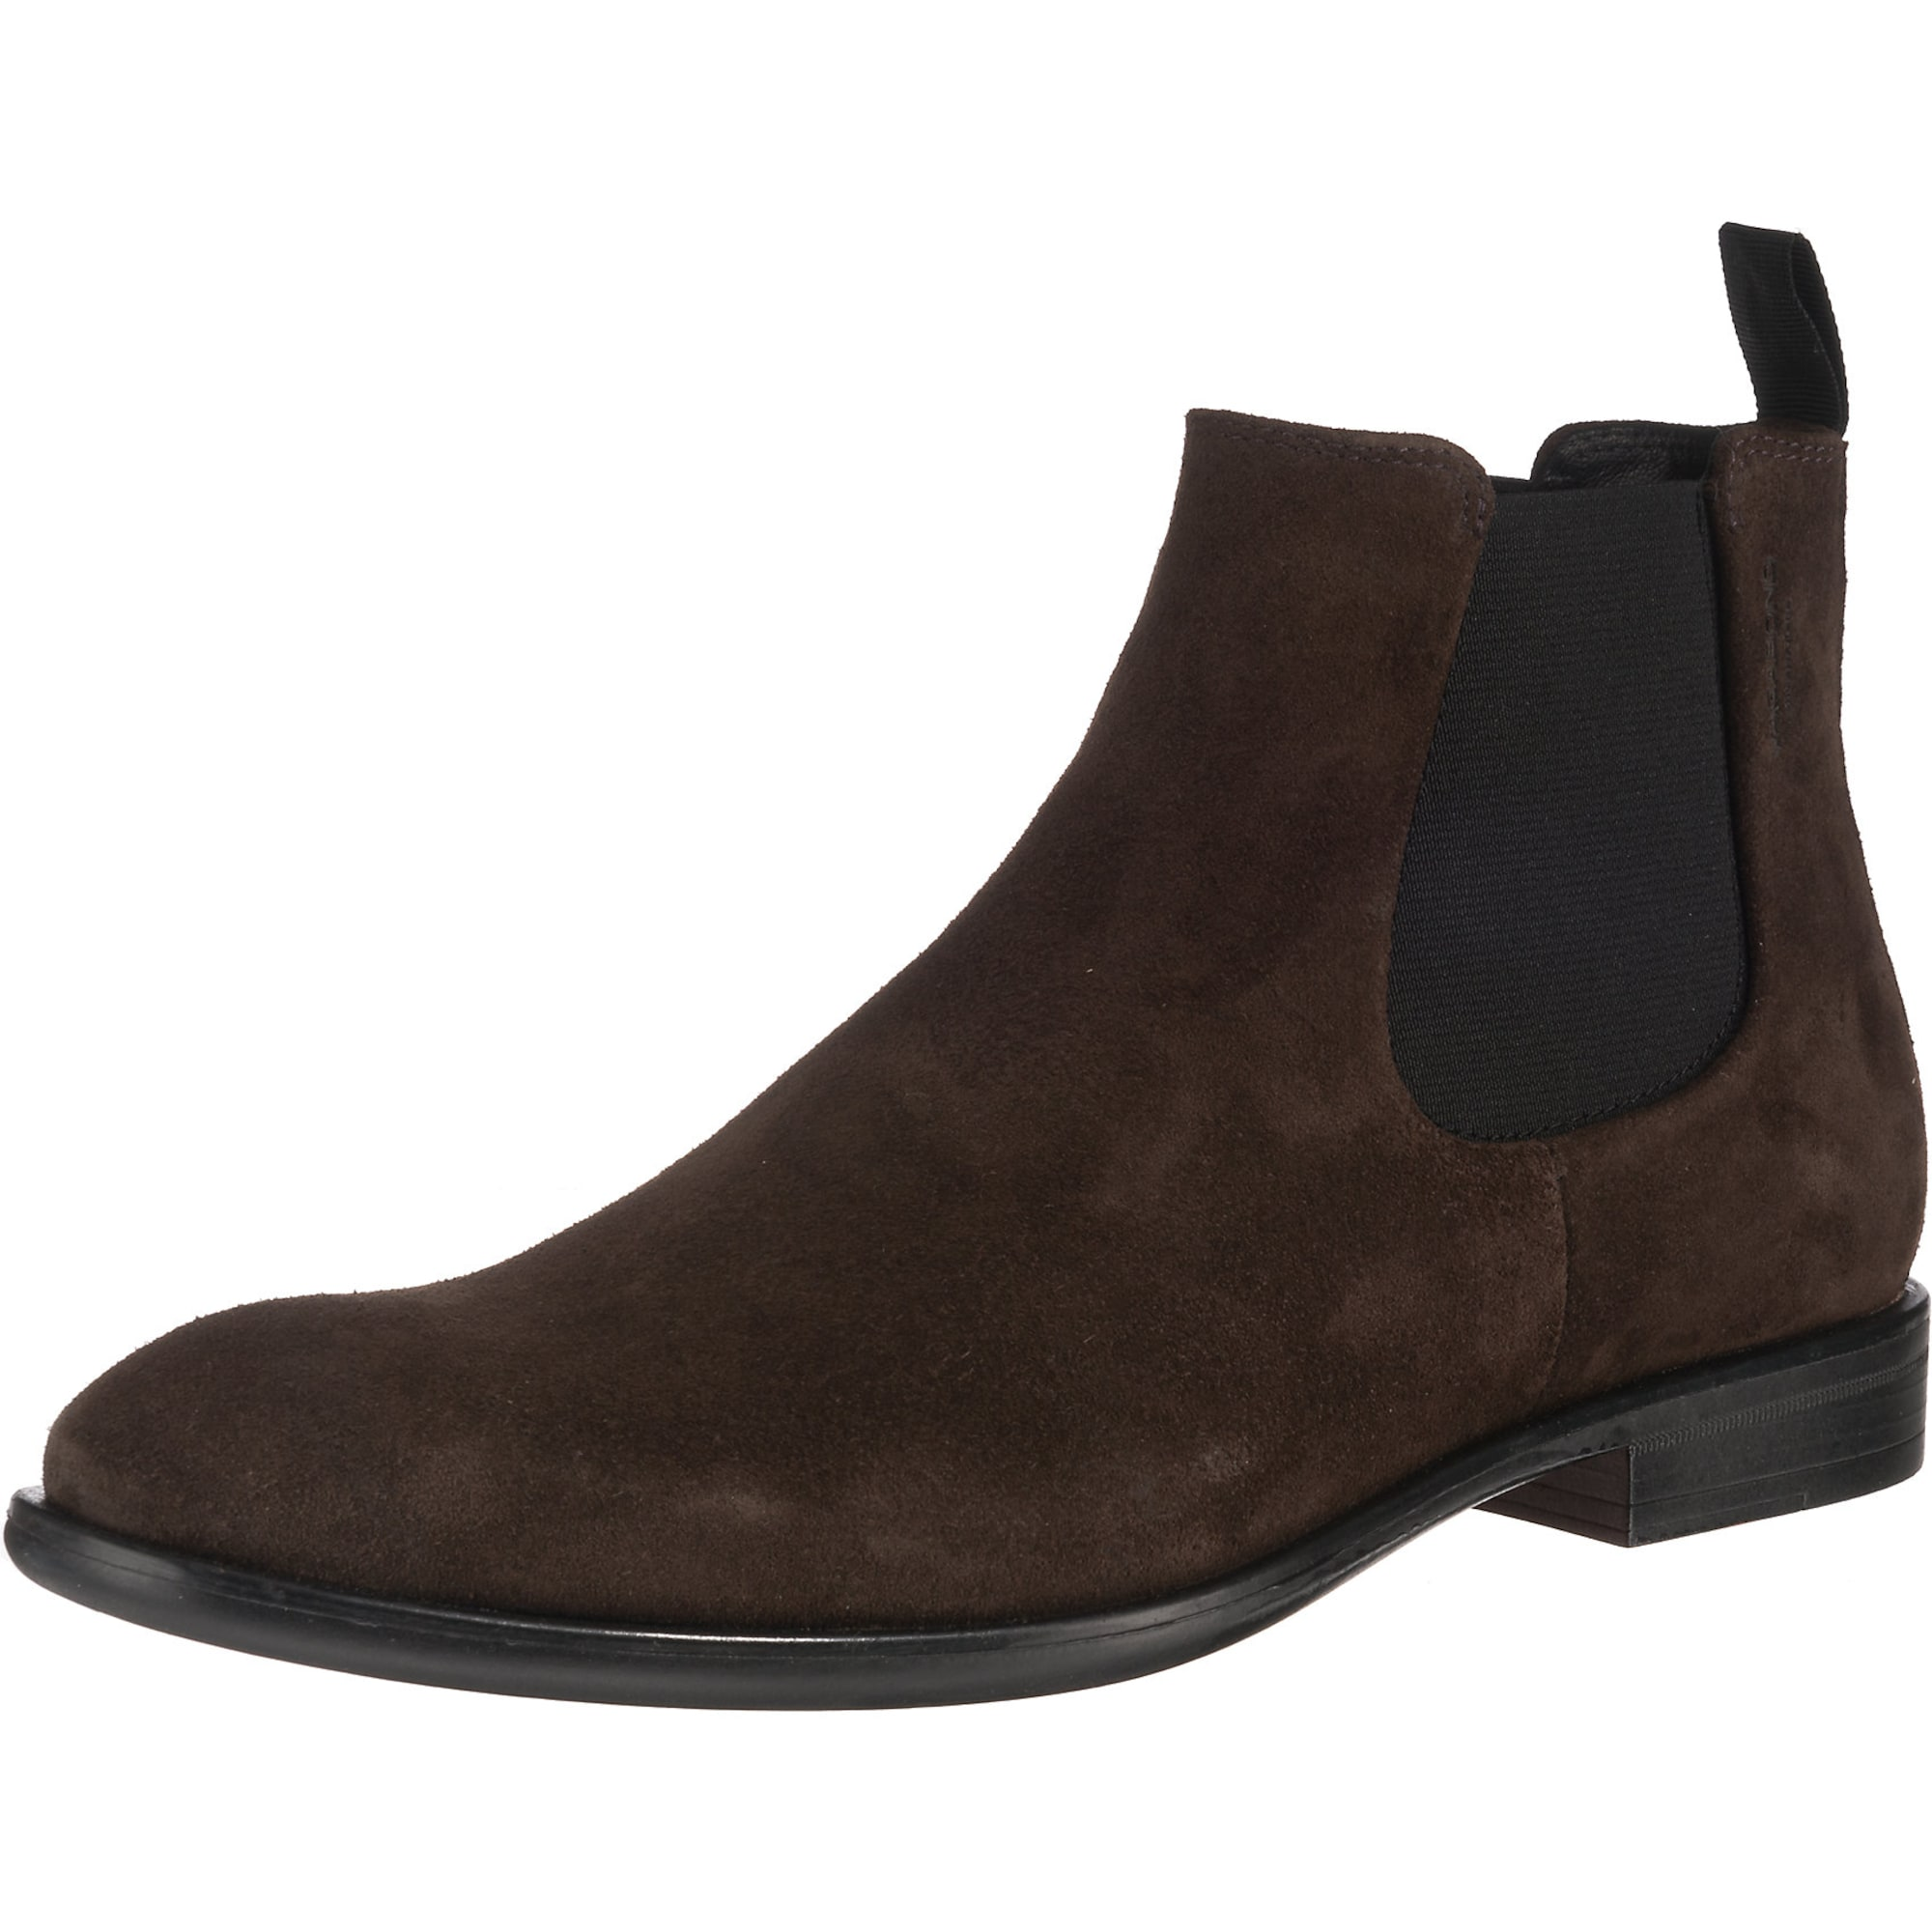 Chelsea Boots 'Harvey' | Schuhe > Boots > Chelsea-Boots | Braun | VAGABOND SHOEMAKERS